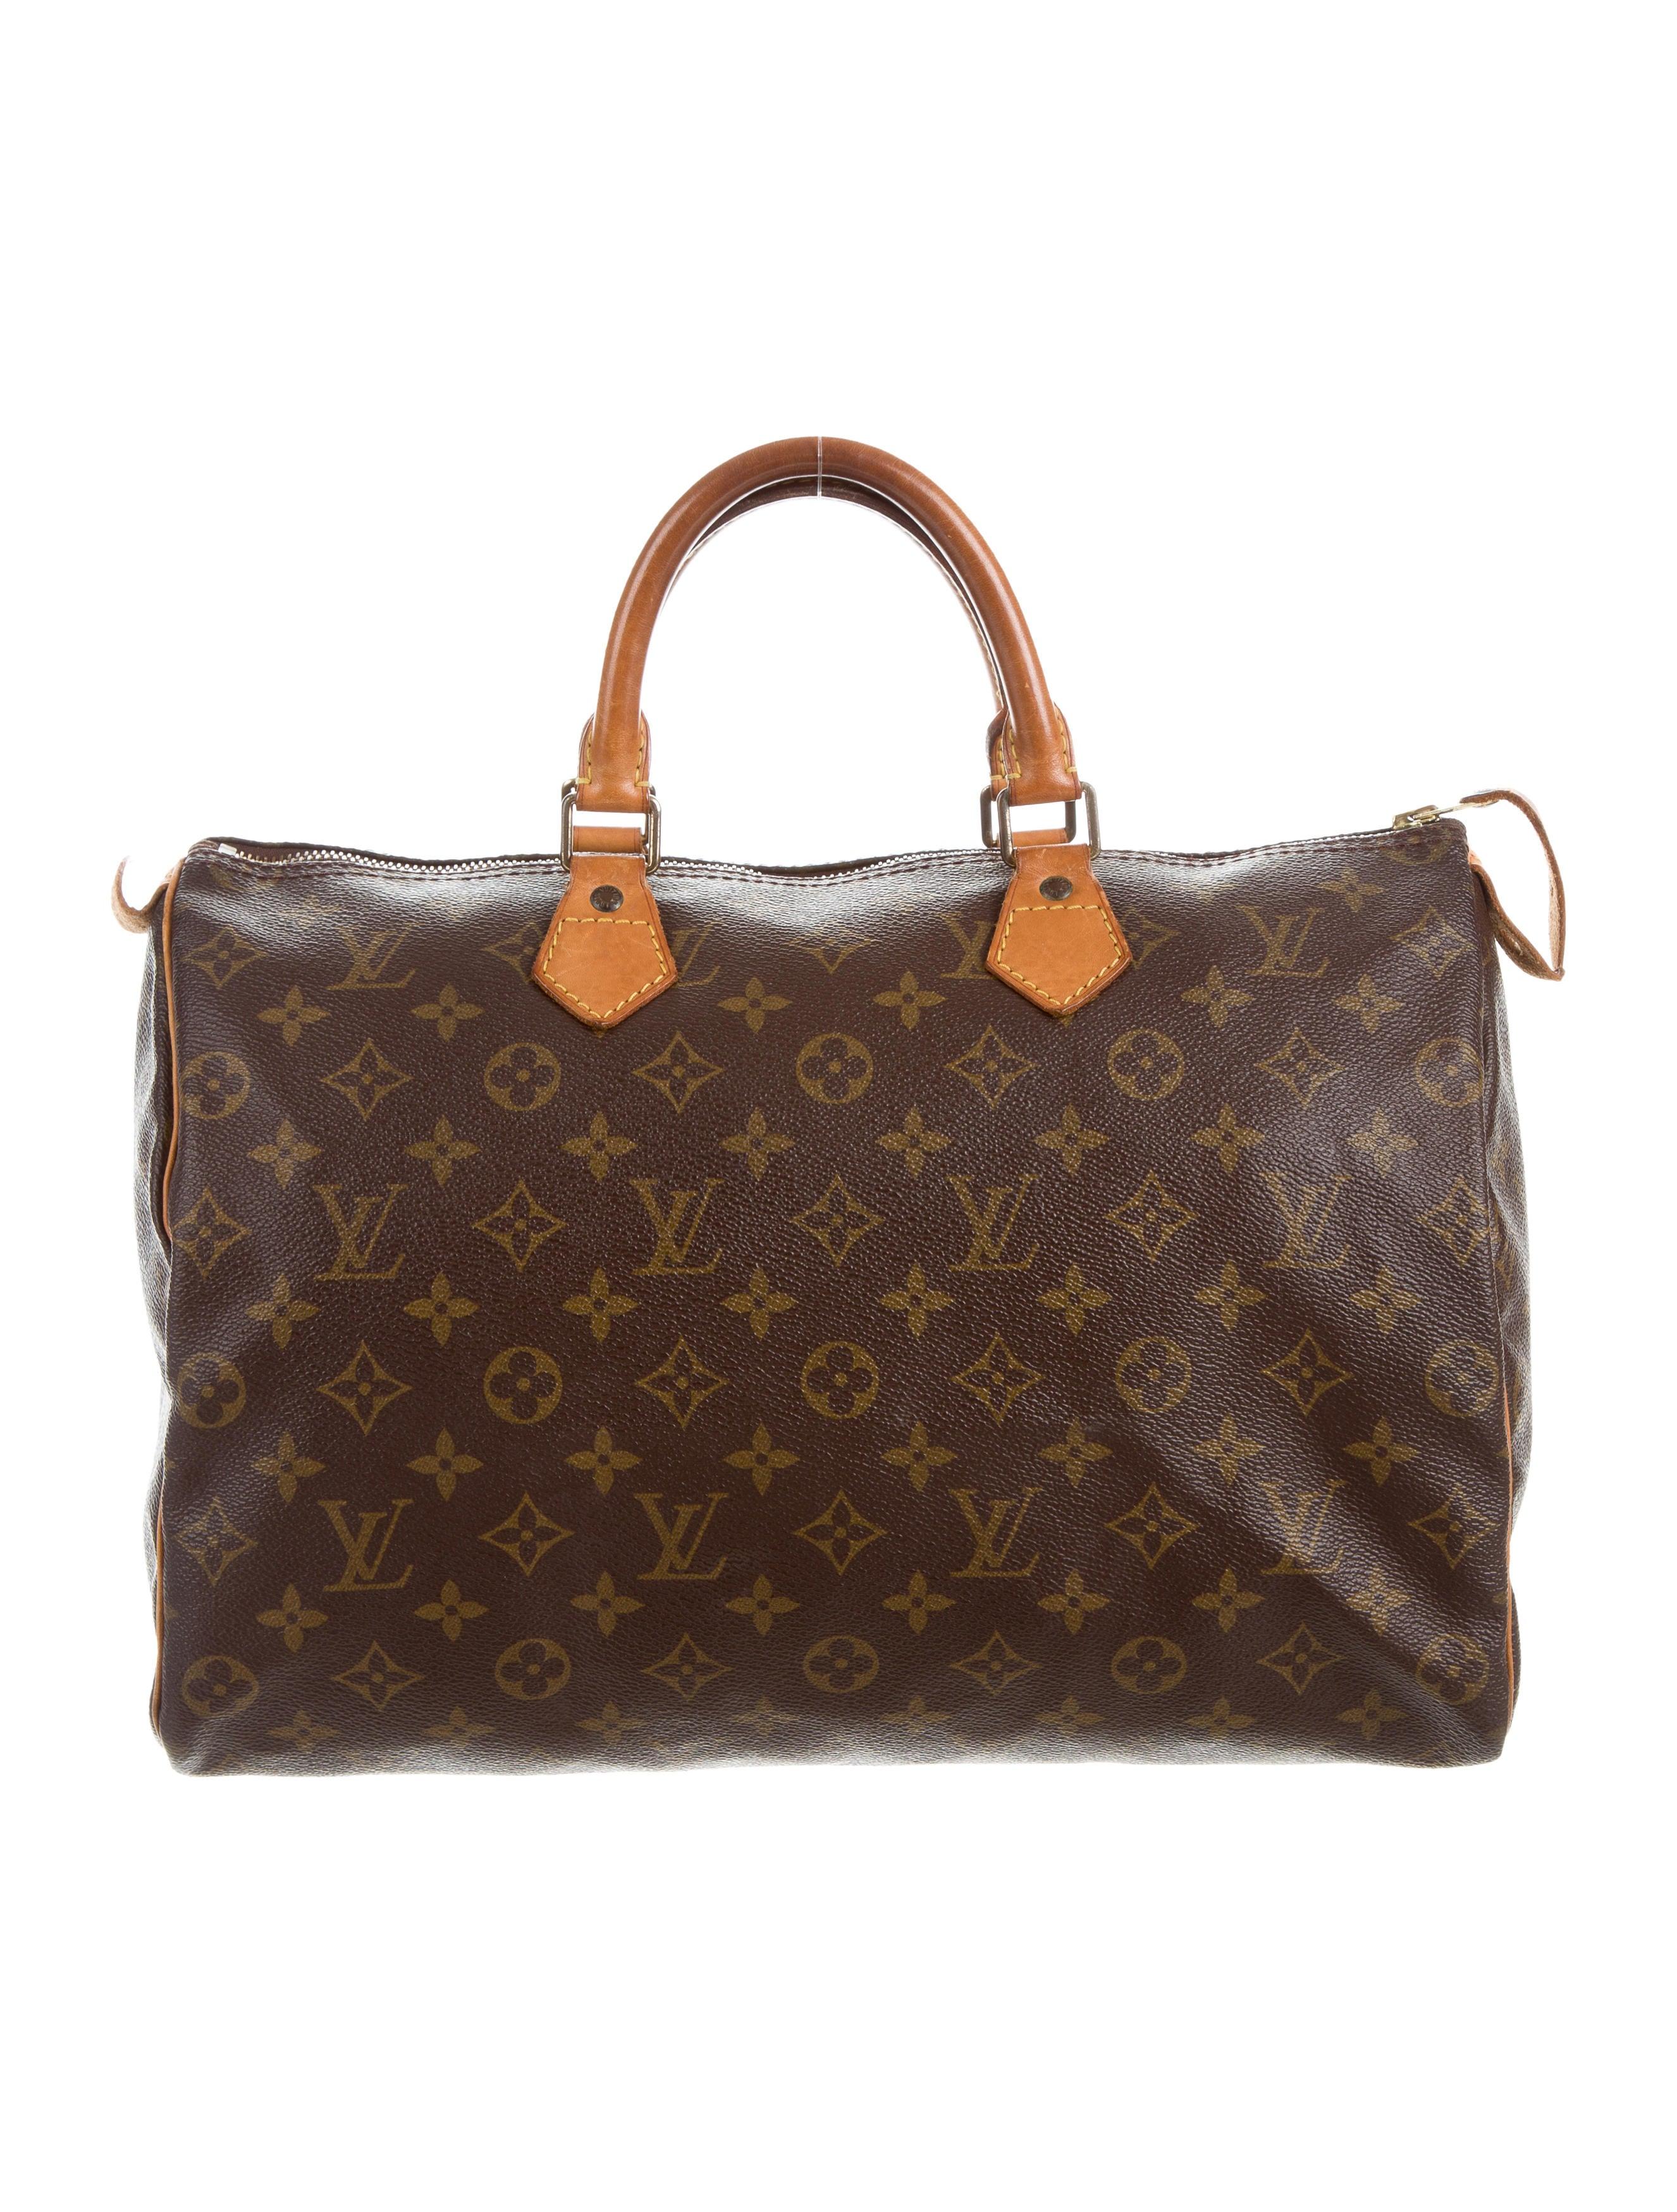 Louis vuitton monogram speedy 35 handbags lou125051 for Louis vuitton miroir speedy 35